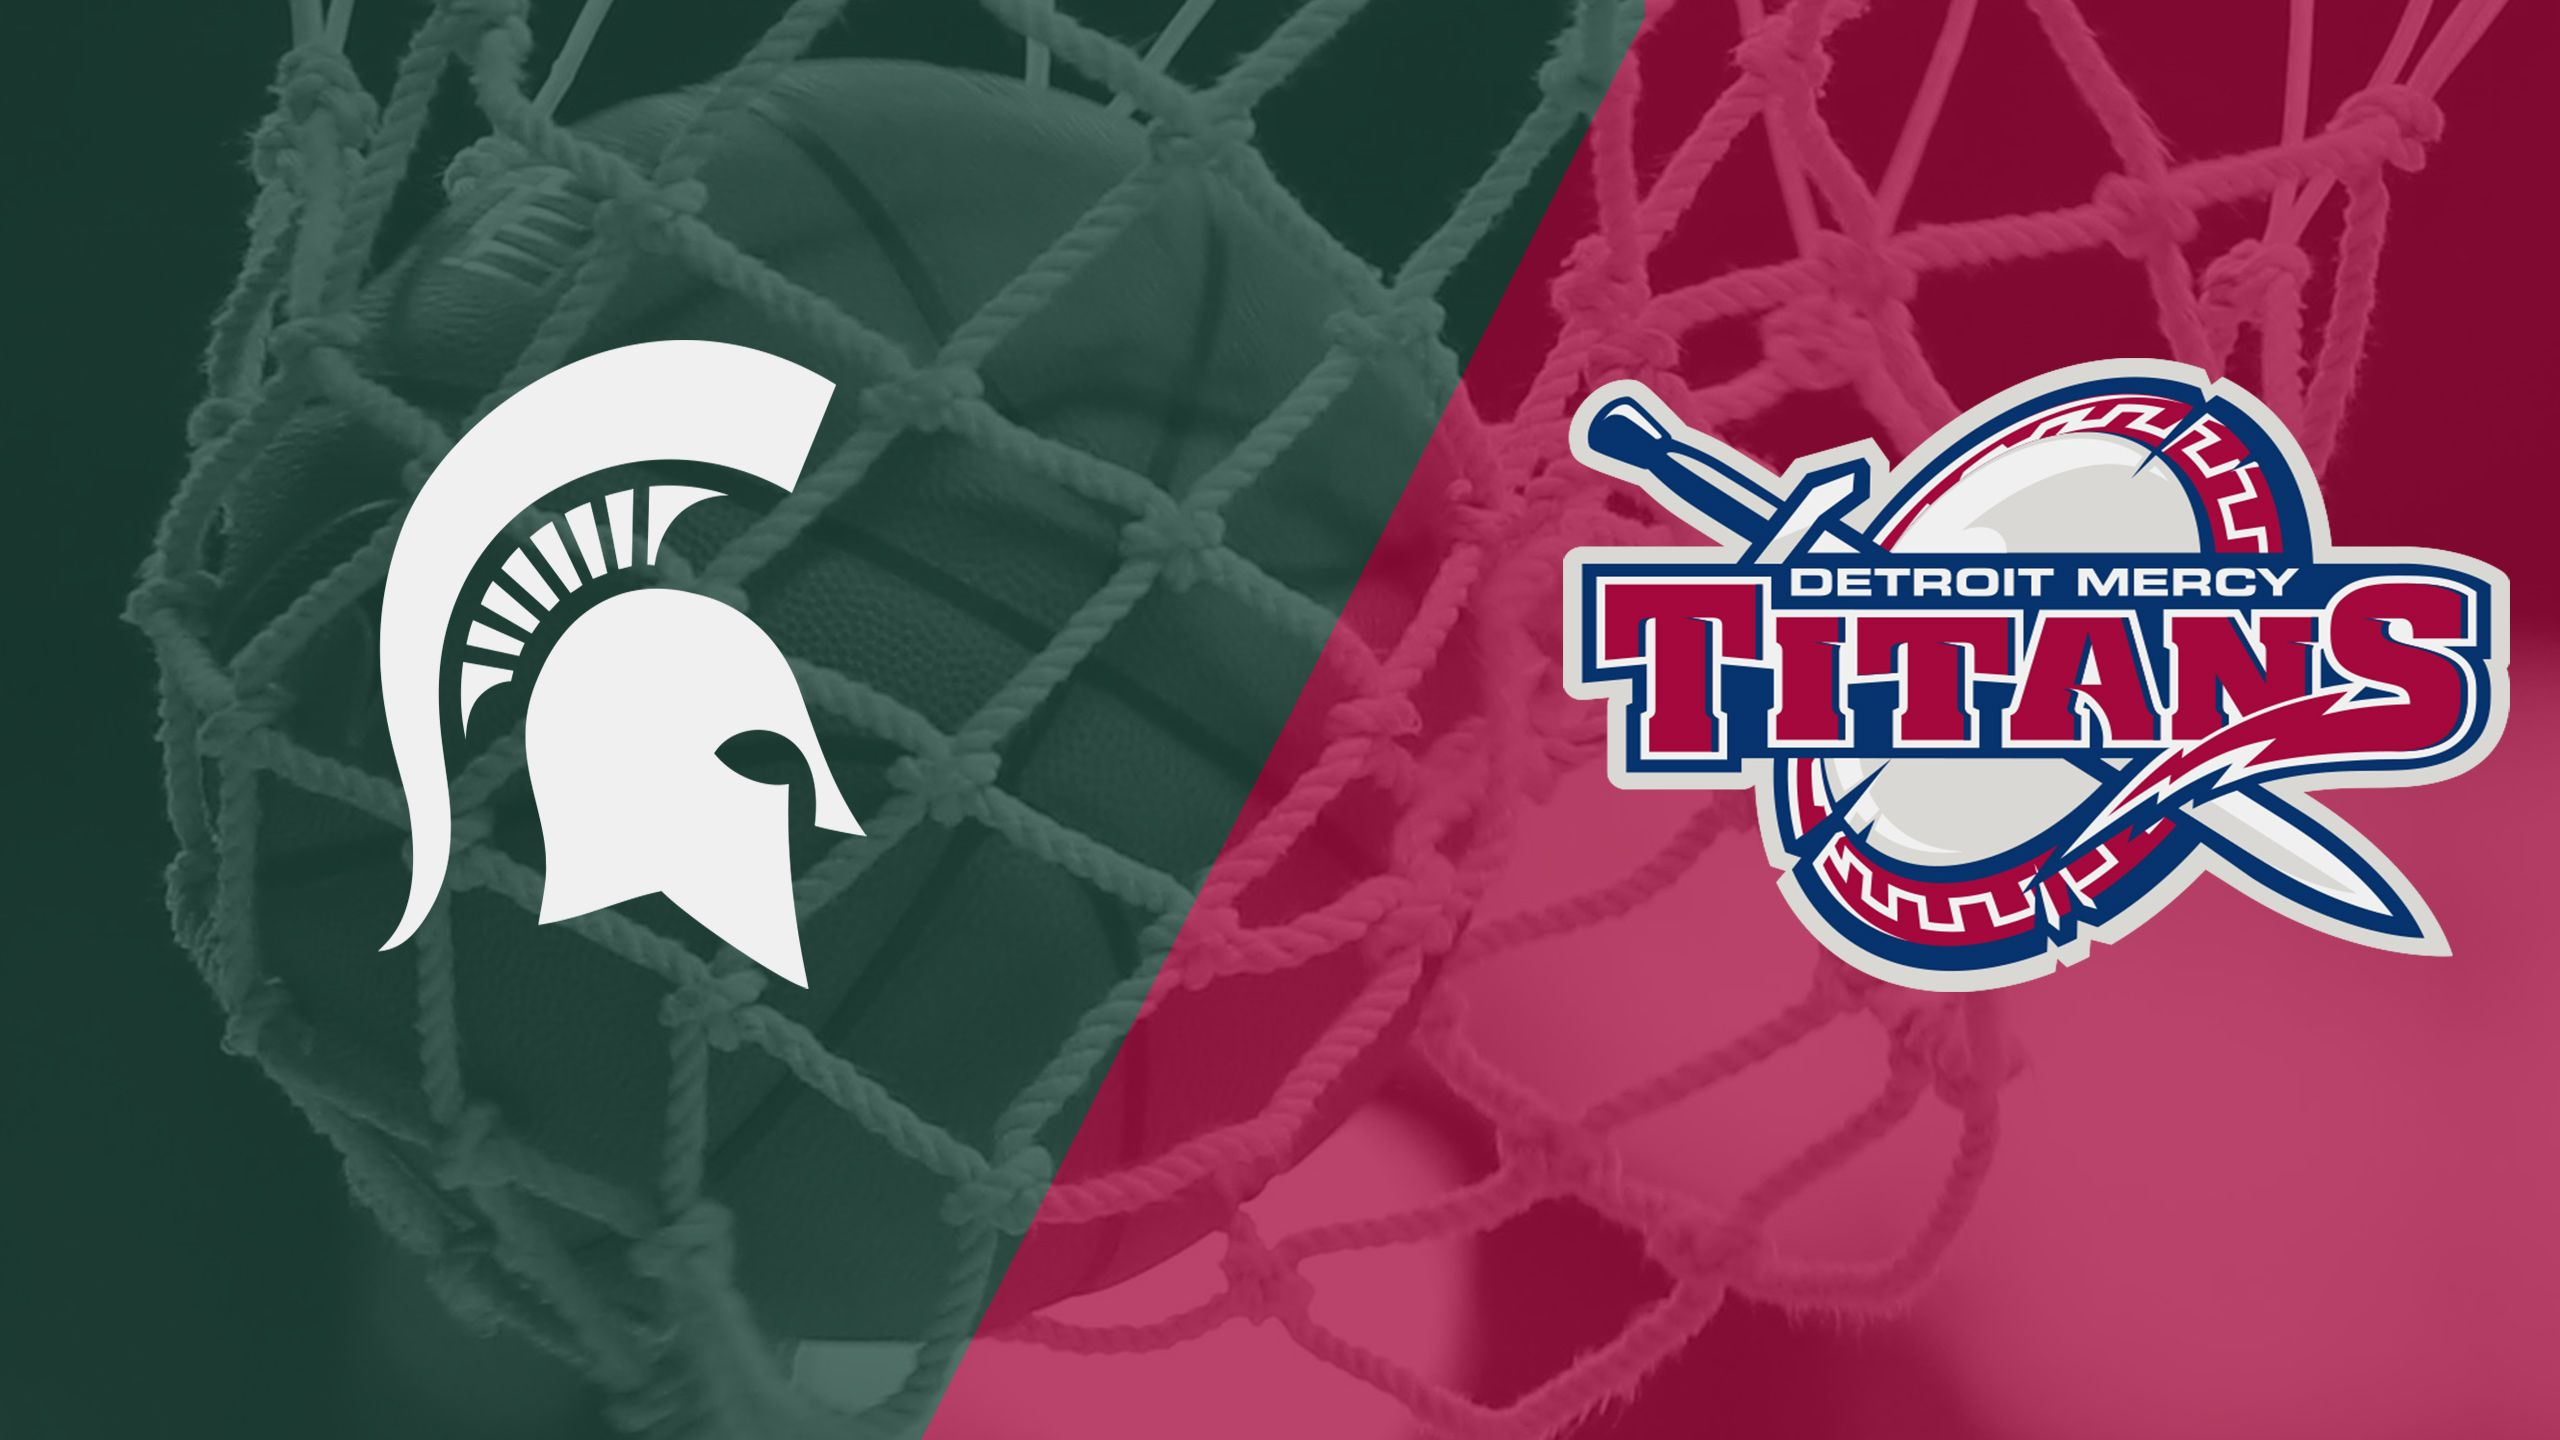 Michigan State vs. Detroit Mercy (W Basketball)